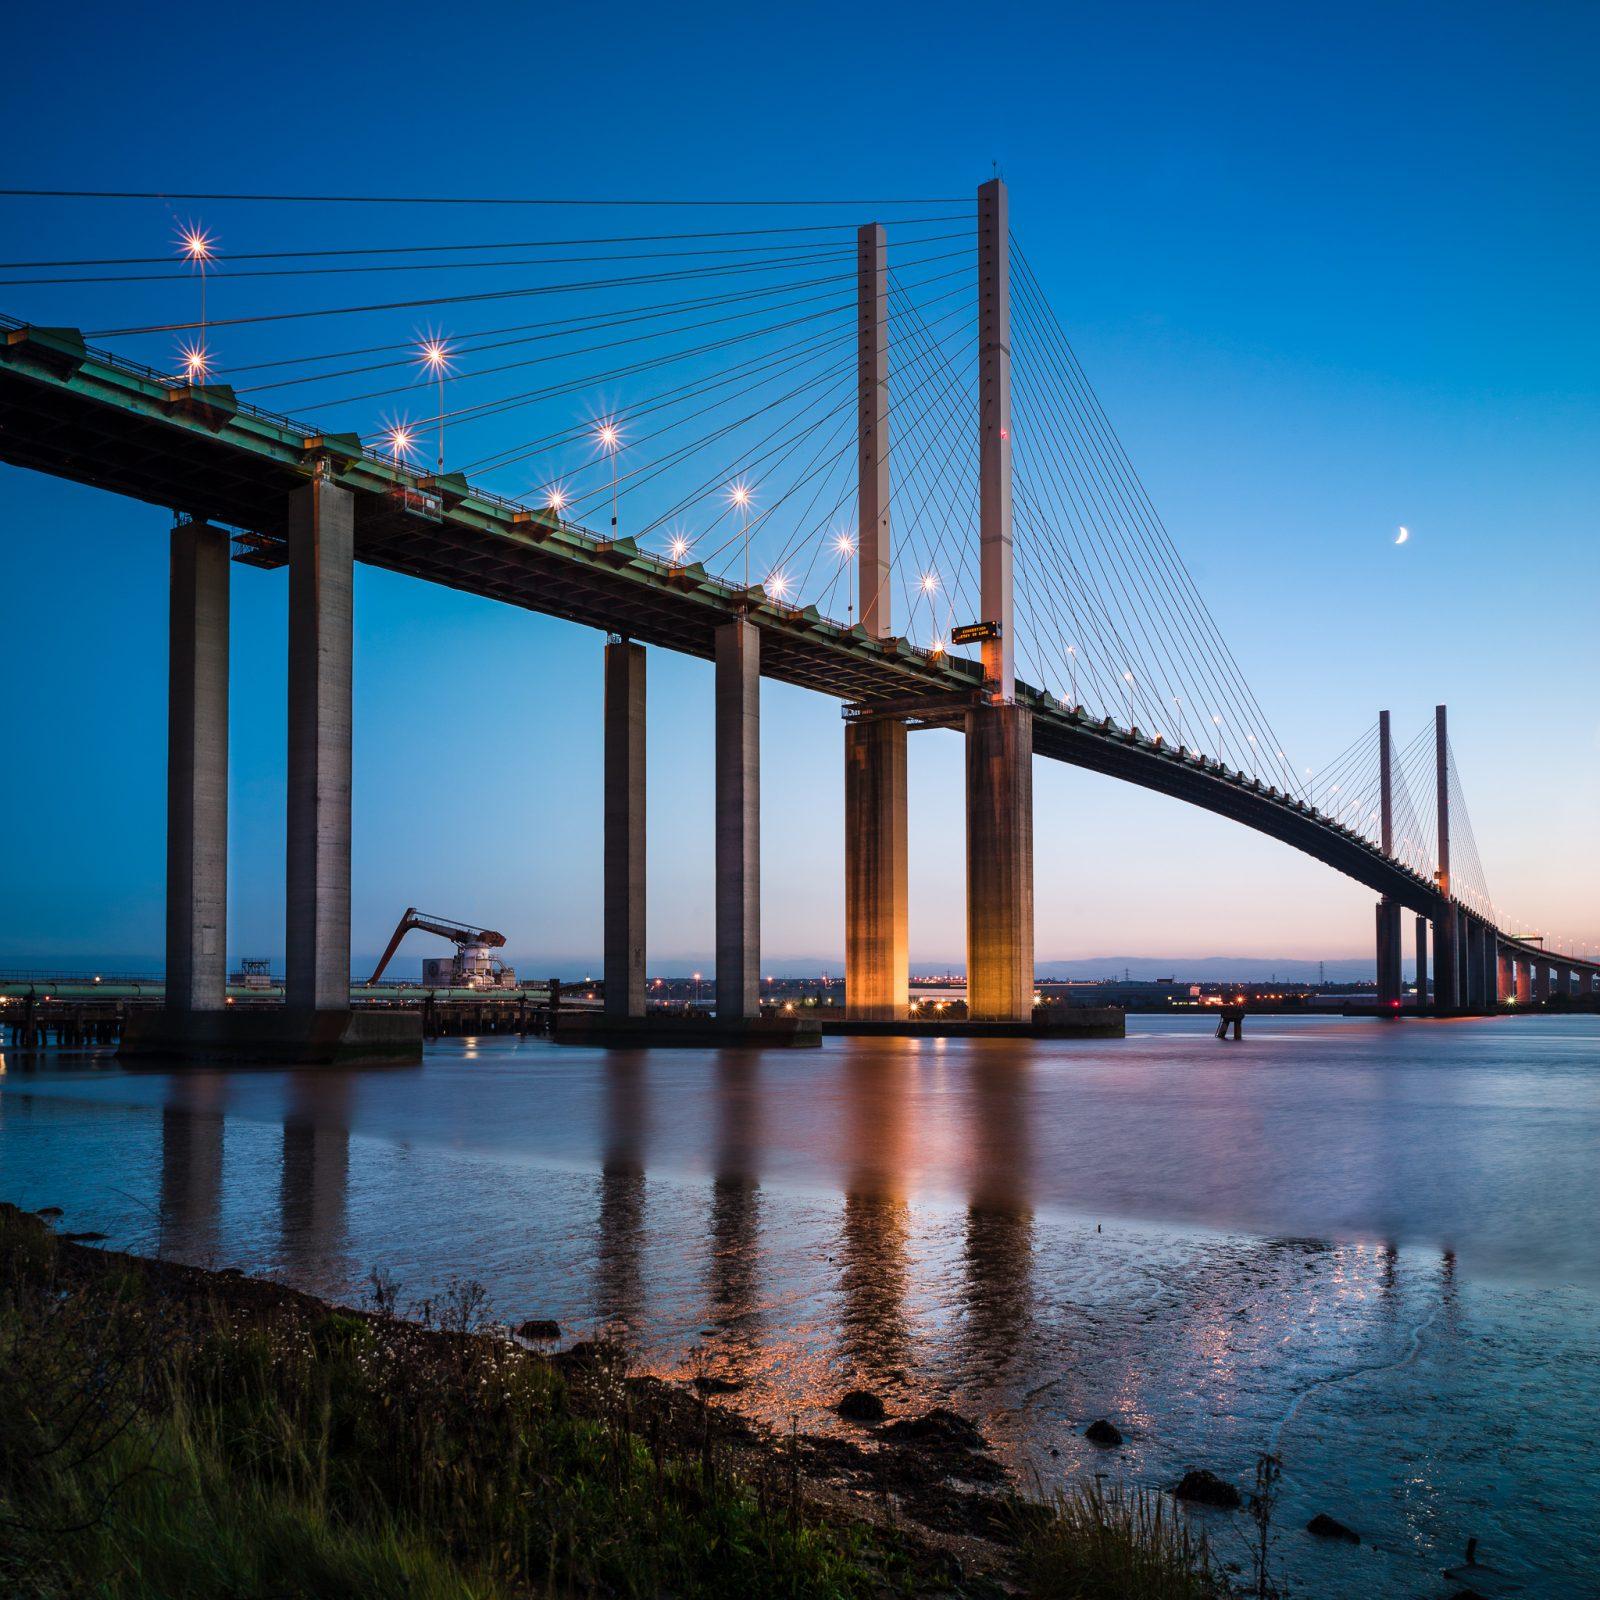 Dartford River Crossing, QEii Bridge